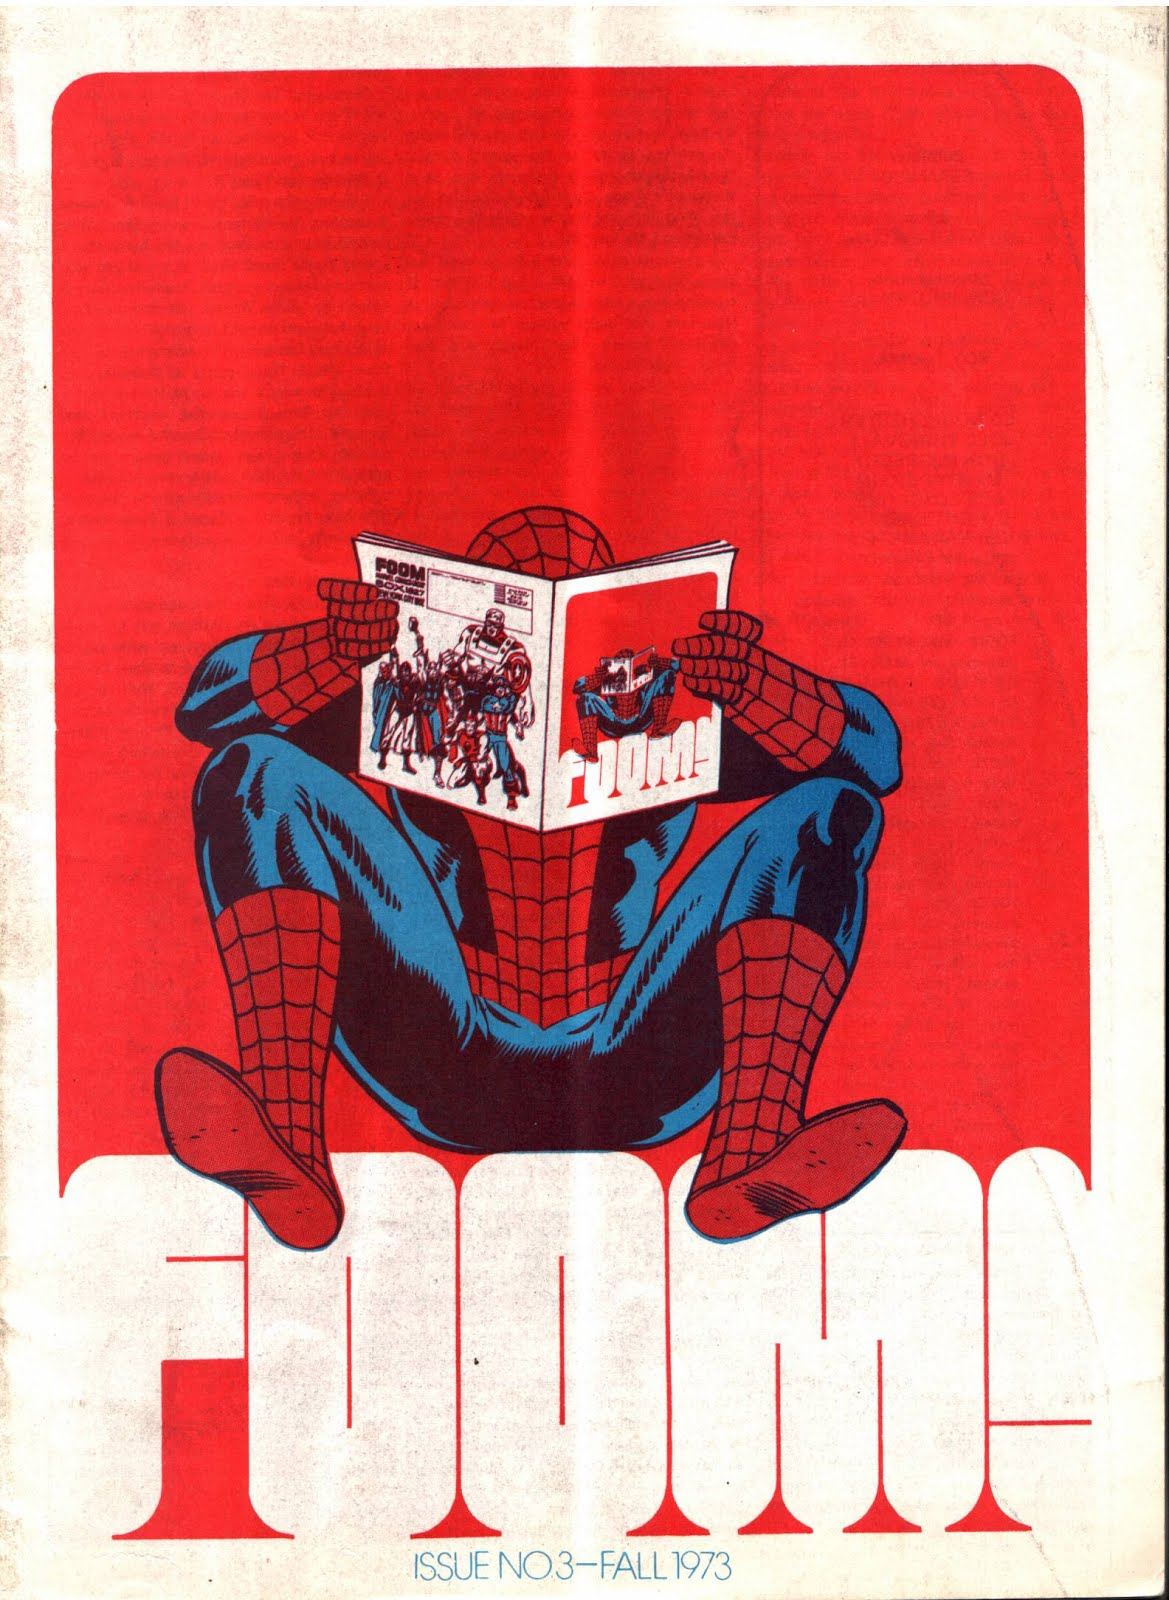 FOOM #3 bronze age 1970s marvel comic book cover art by Jim Steranko